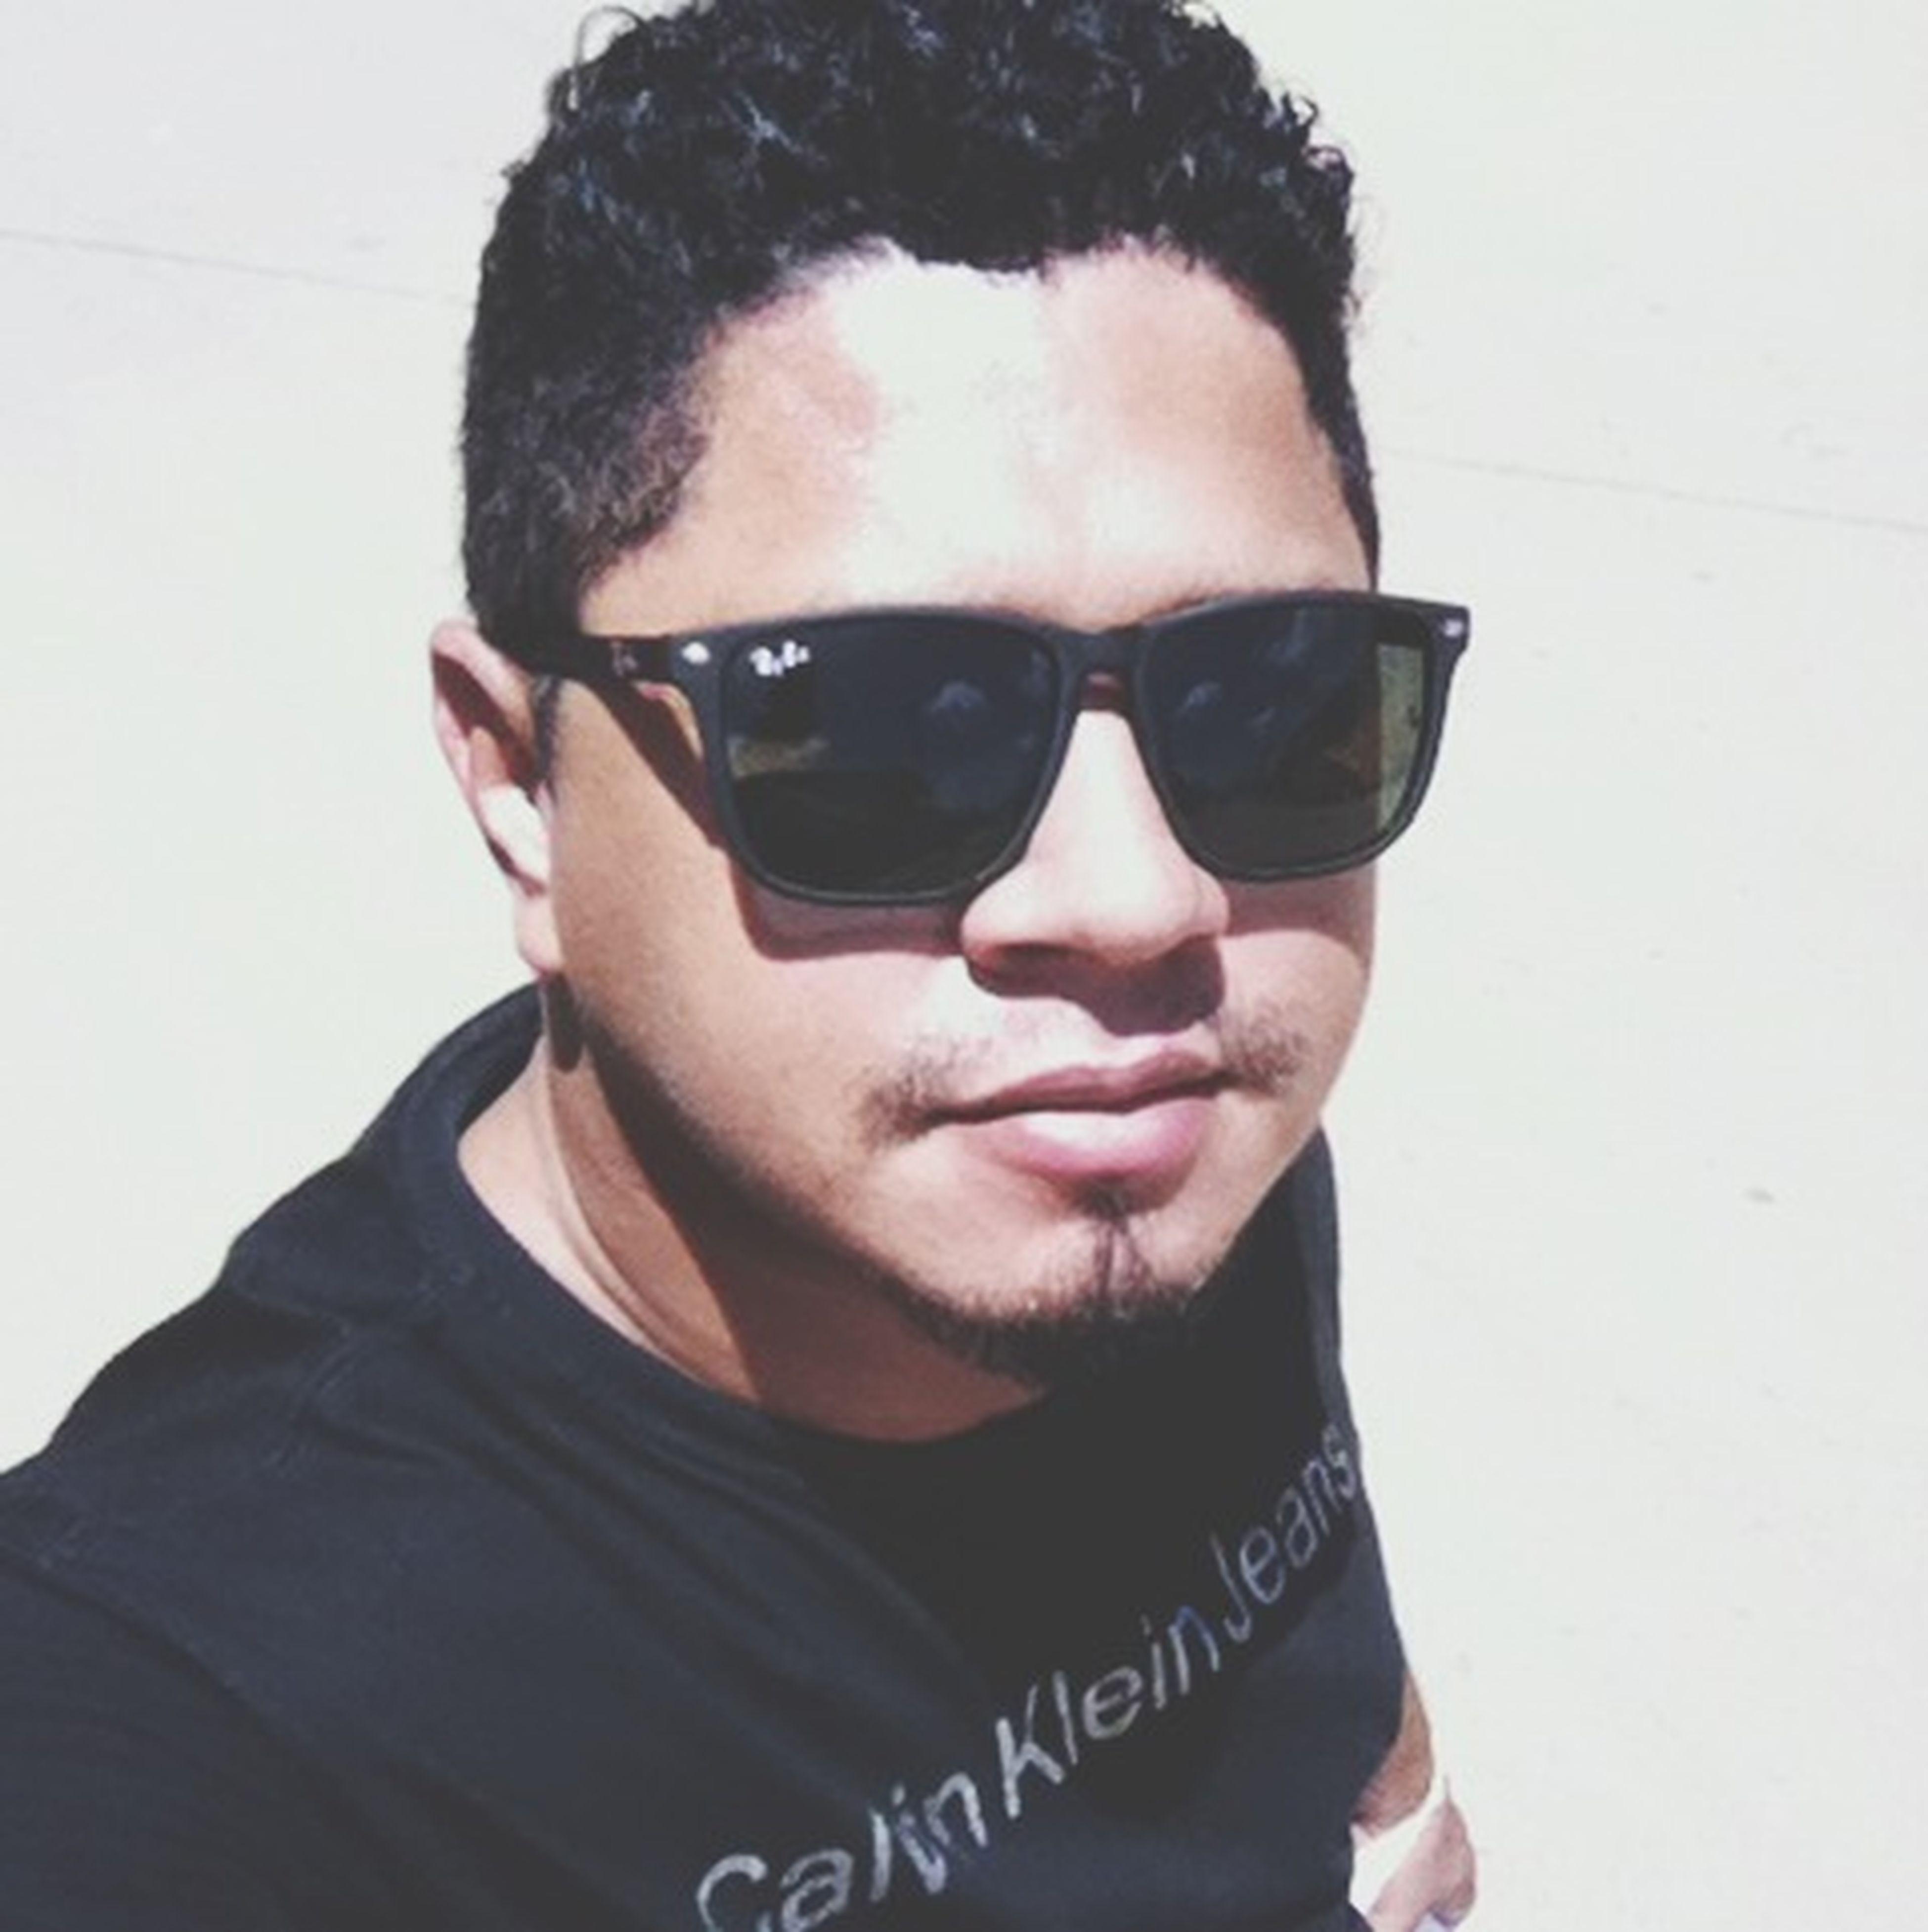 That's Me Self Portrait Street Fashion Instagram